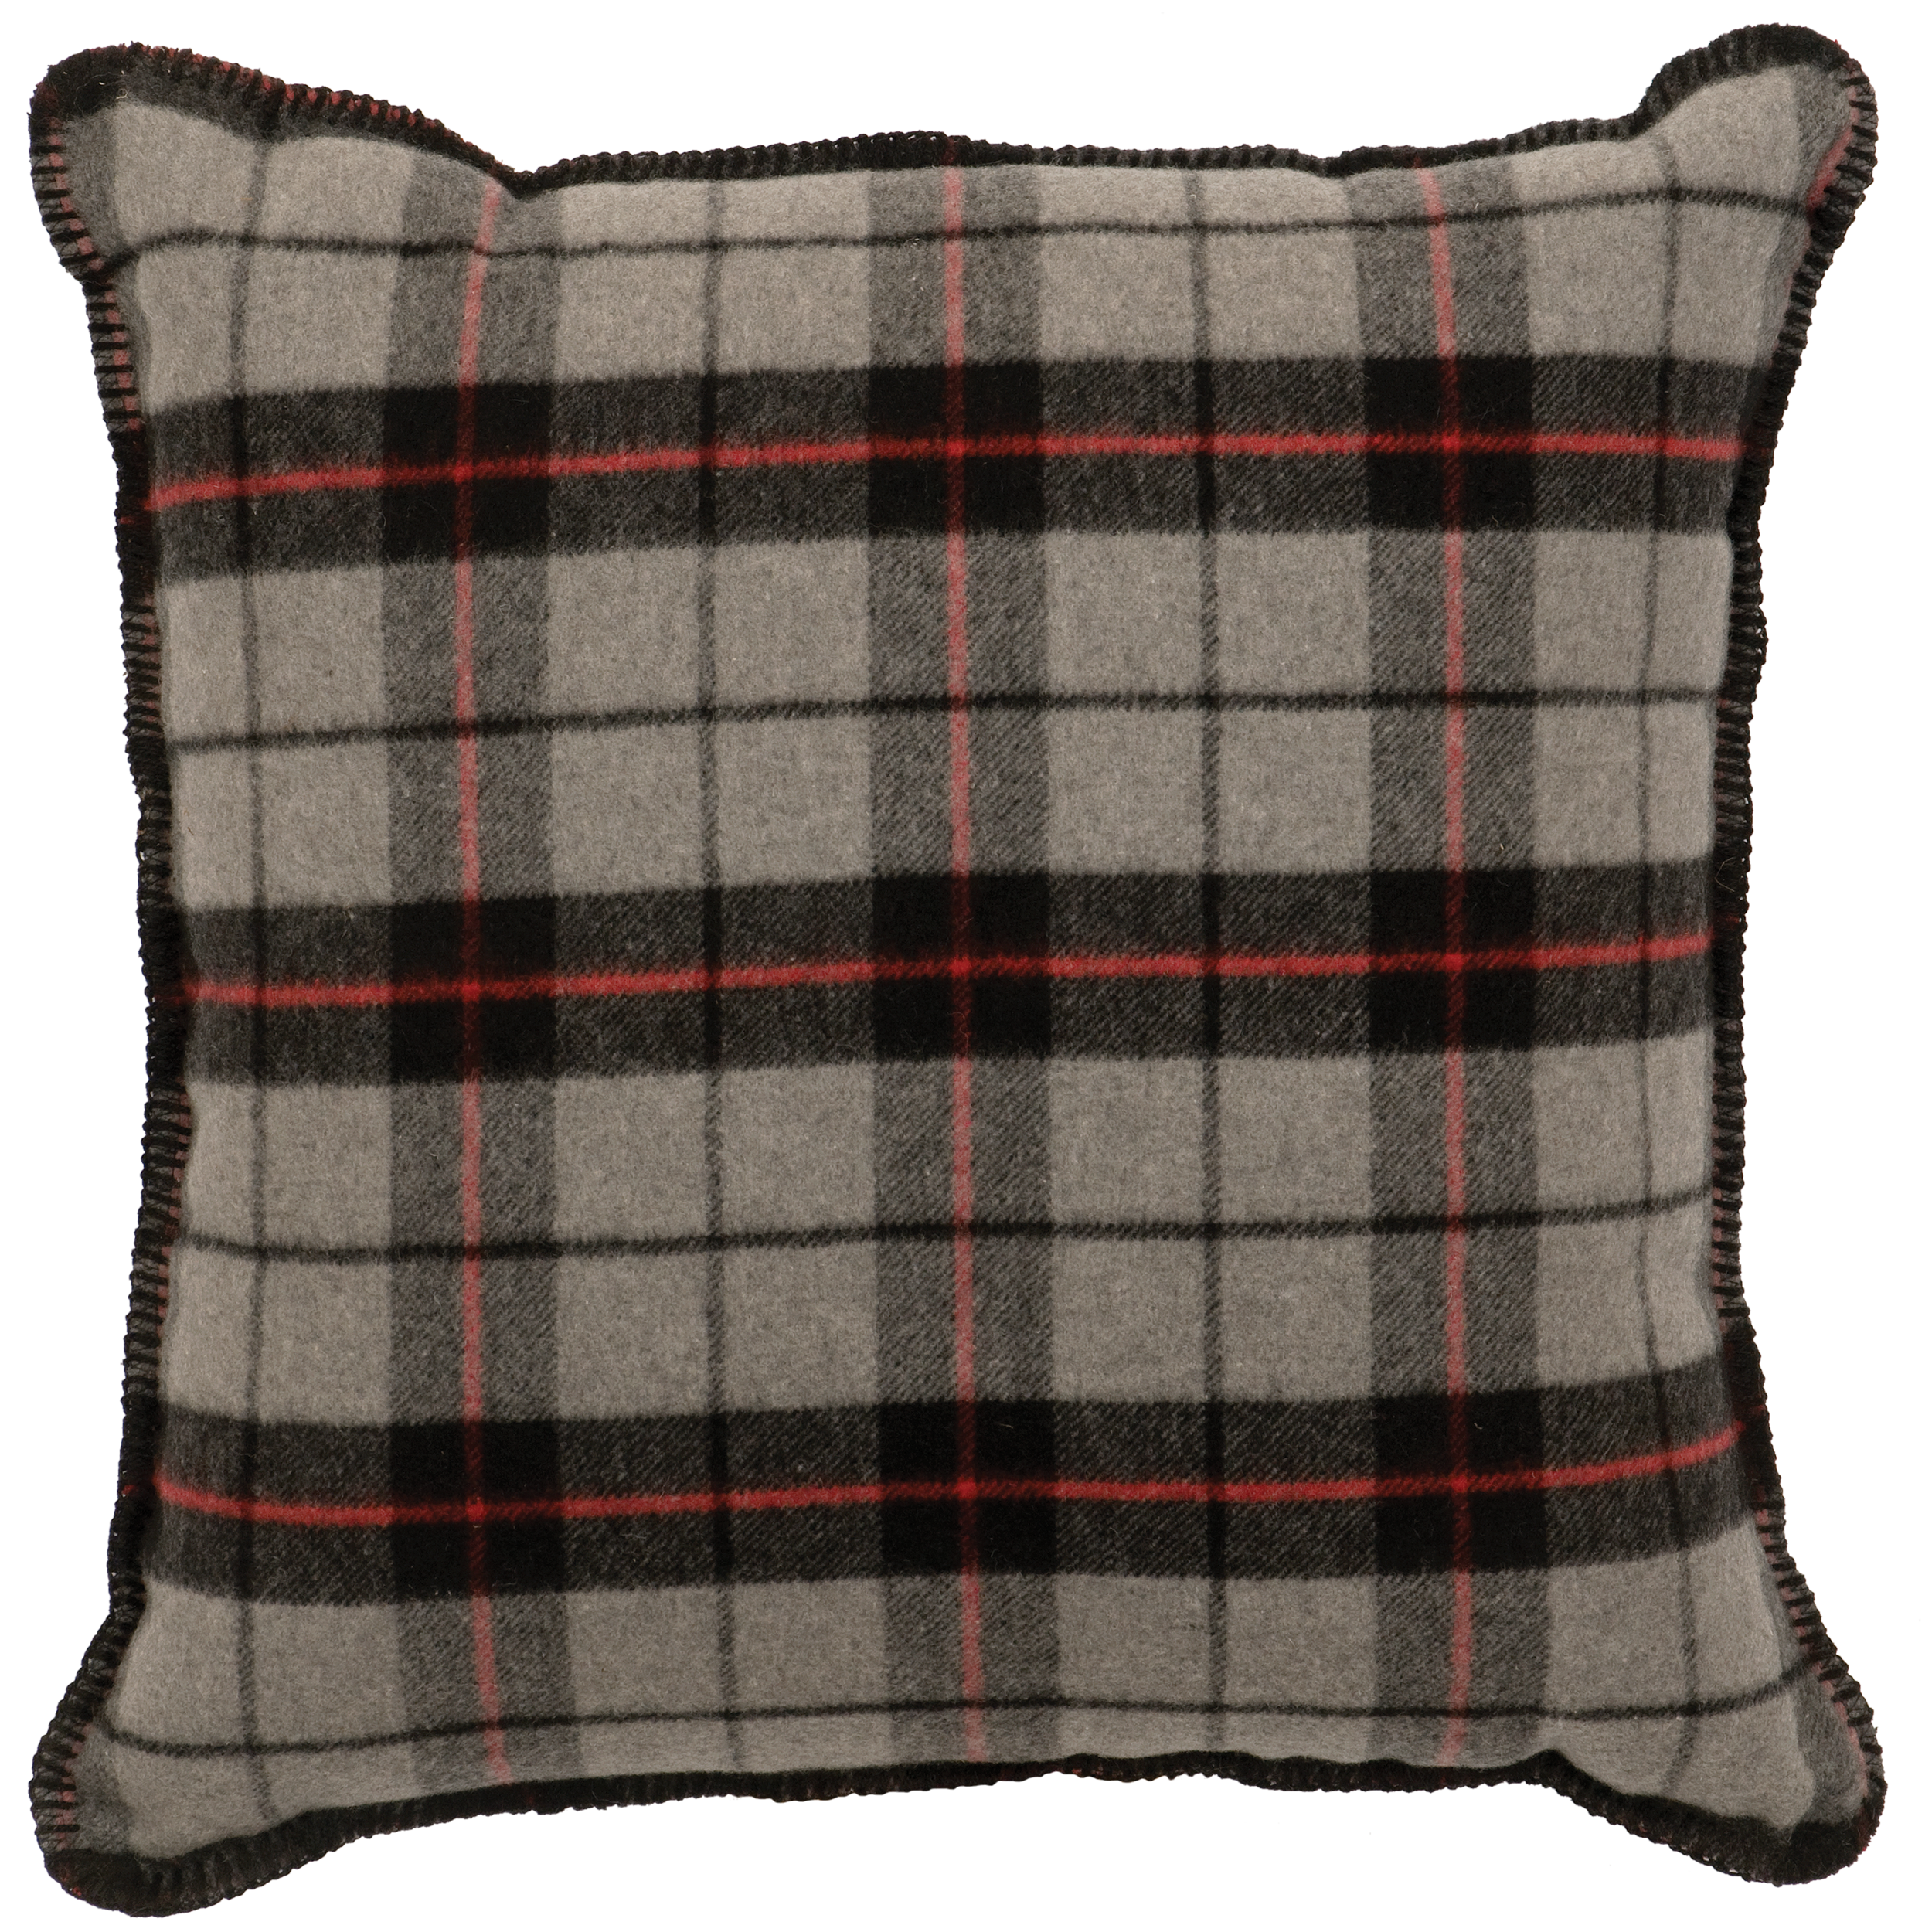 Ponderosa Plaid Pillow - 20